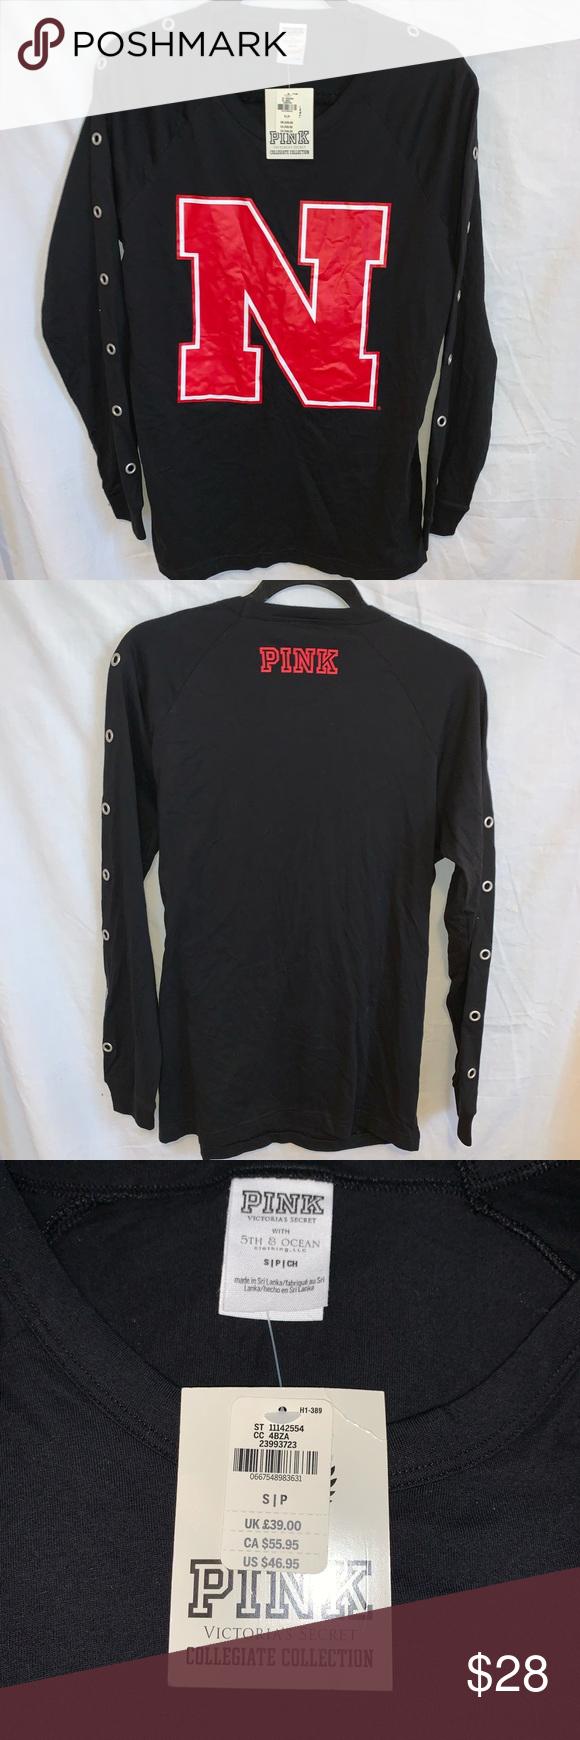 Pink Nebraska Sweatshirt Nwt Sweatshirts Sweatshirts Hoodie Sweatshirt Tops [ 1740 x 580 Pixel ]